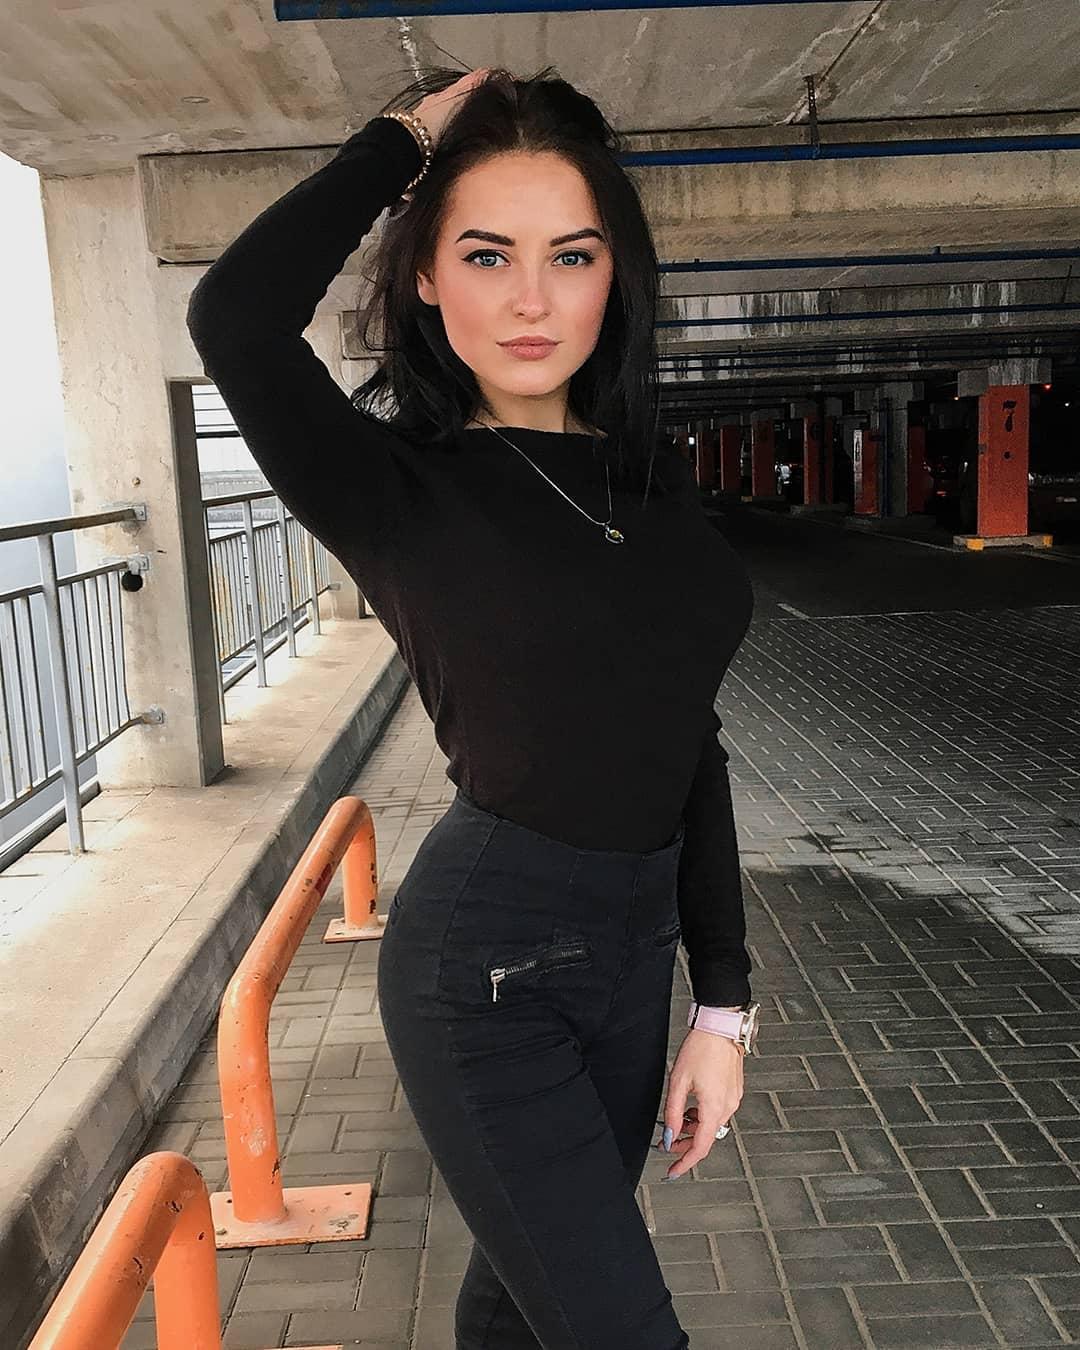 Valeria-Dukova-Wallpapers-Insta-Fit-Bio-3